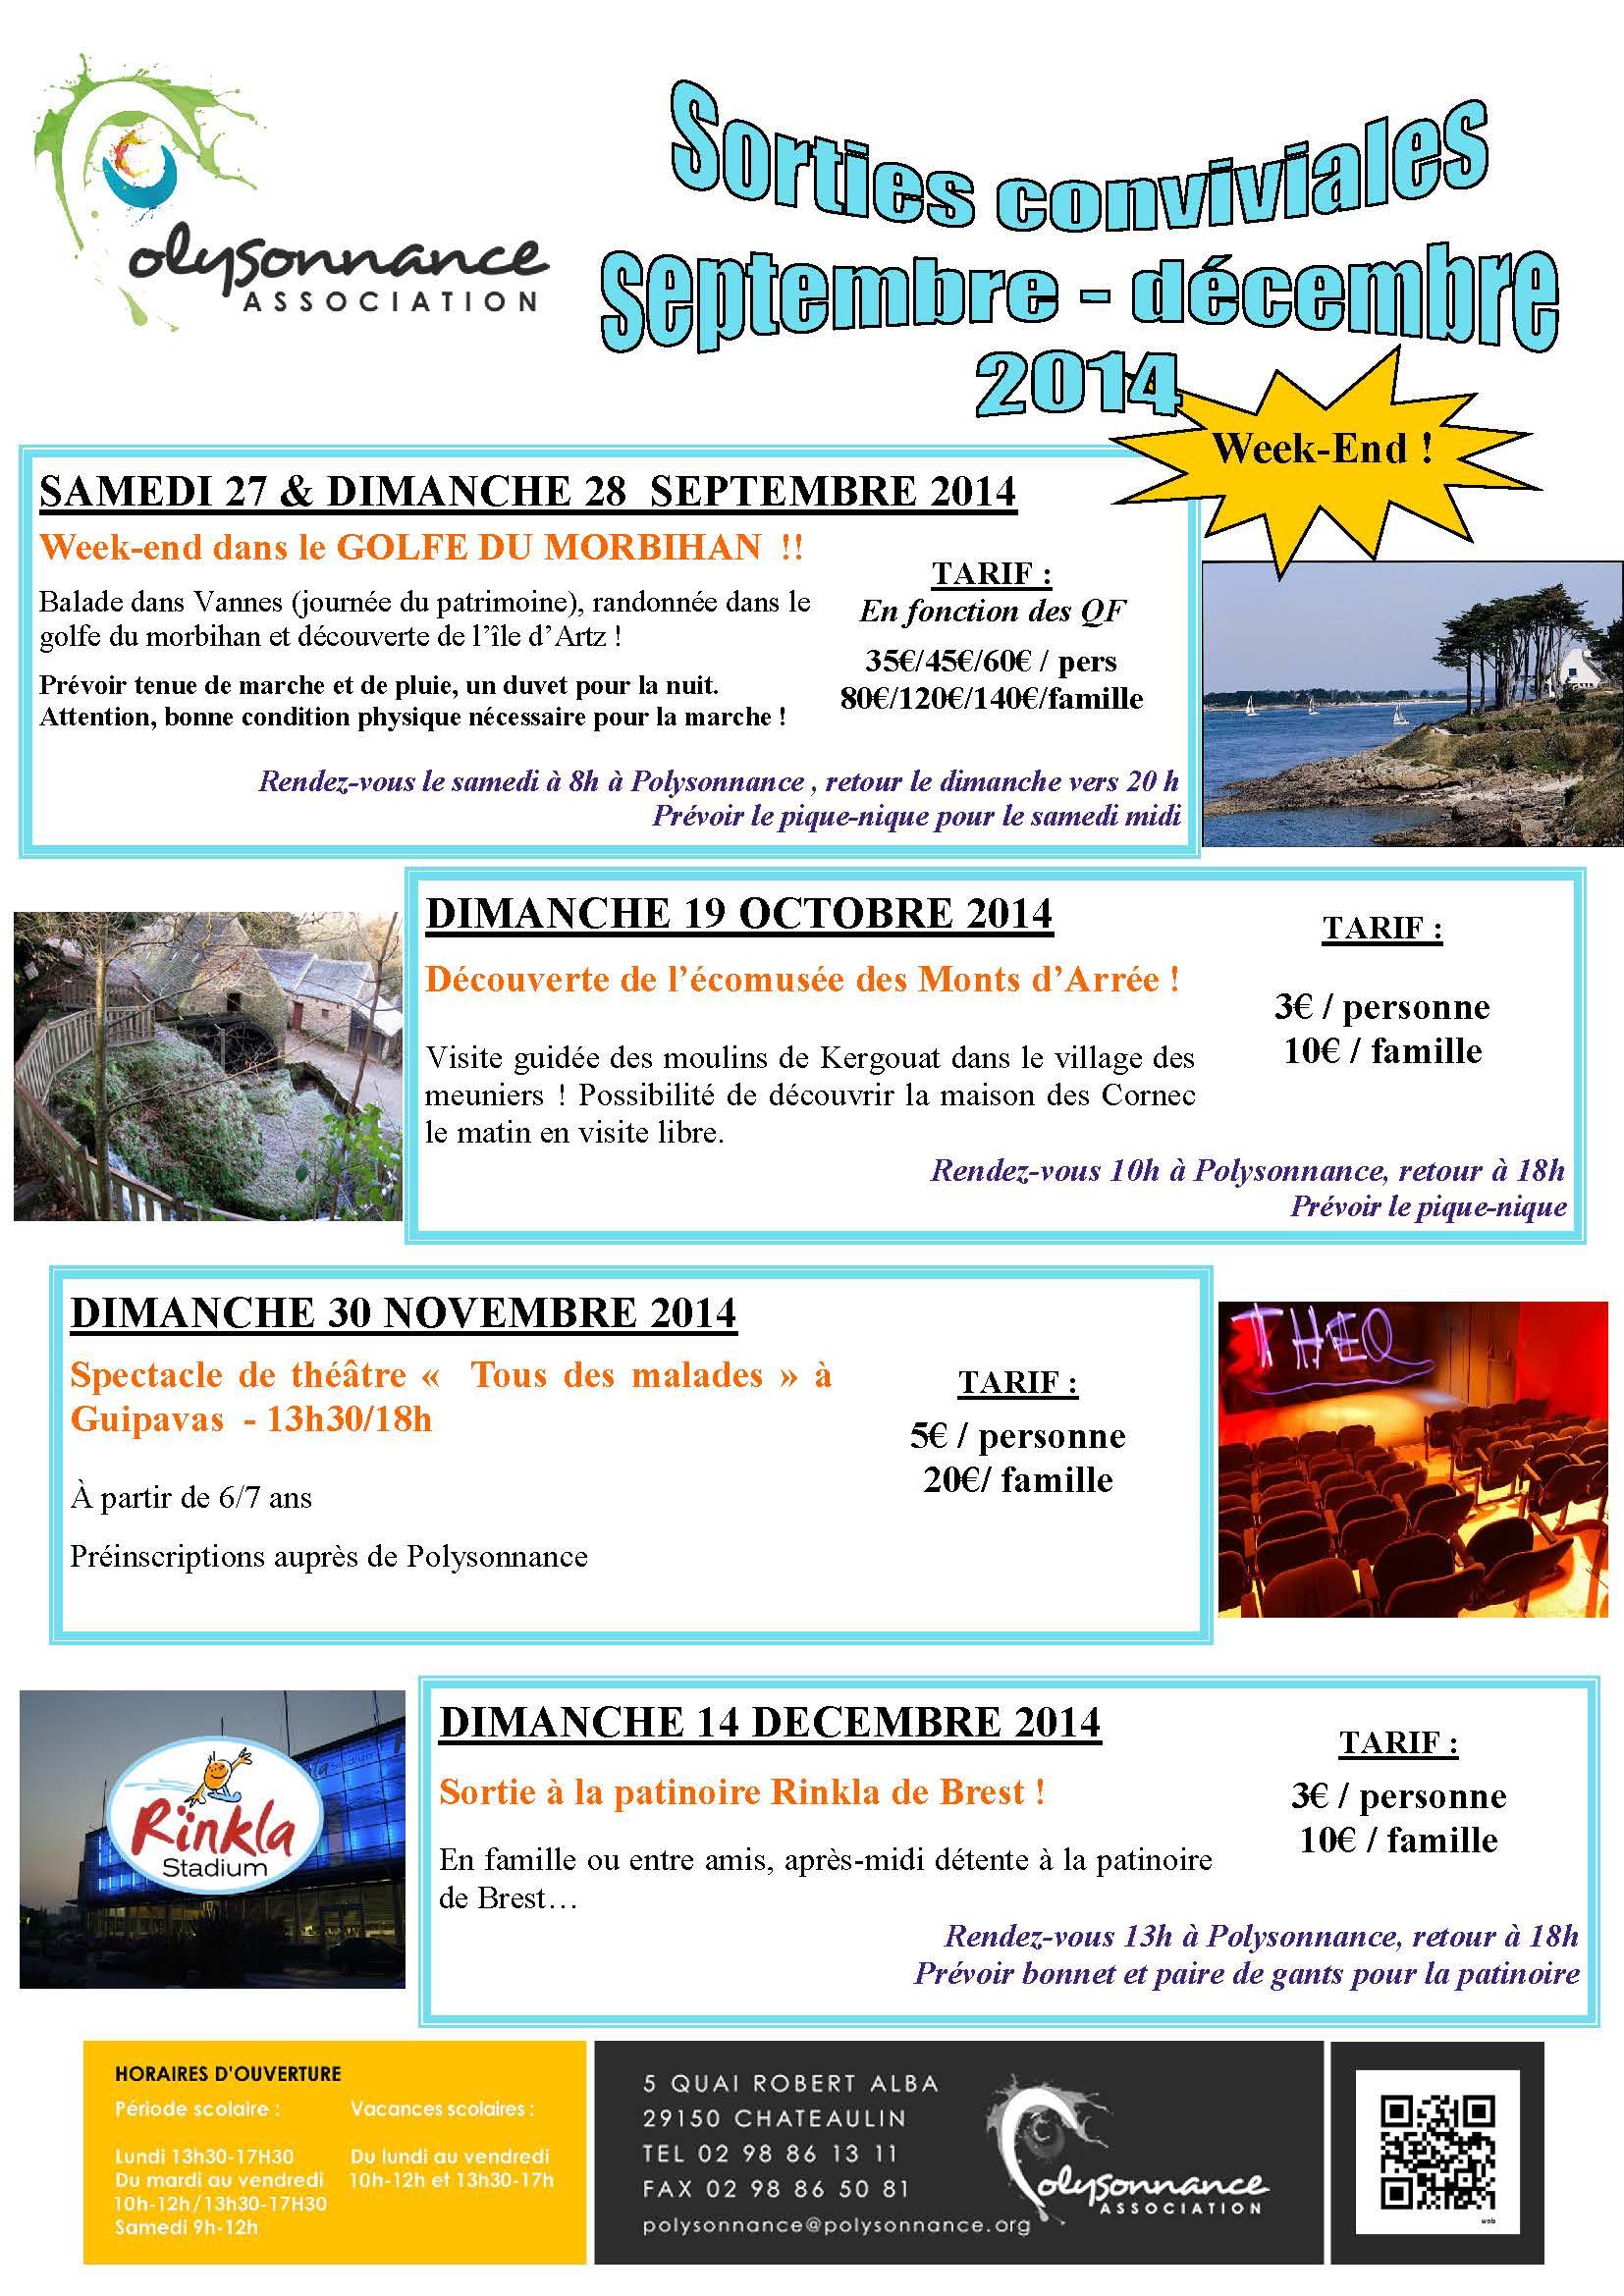 SORTIES FAMILIALES DE SEPTEMBRE A DECEMBRE 2014